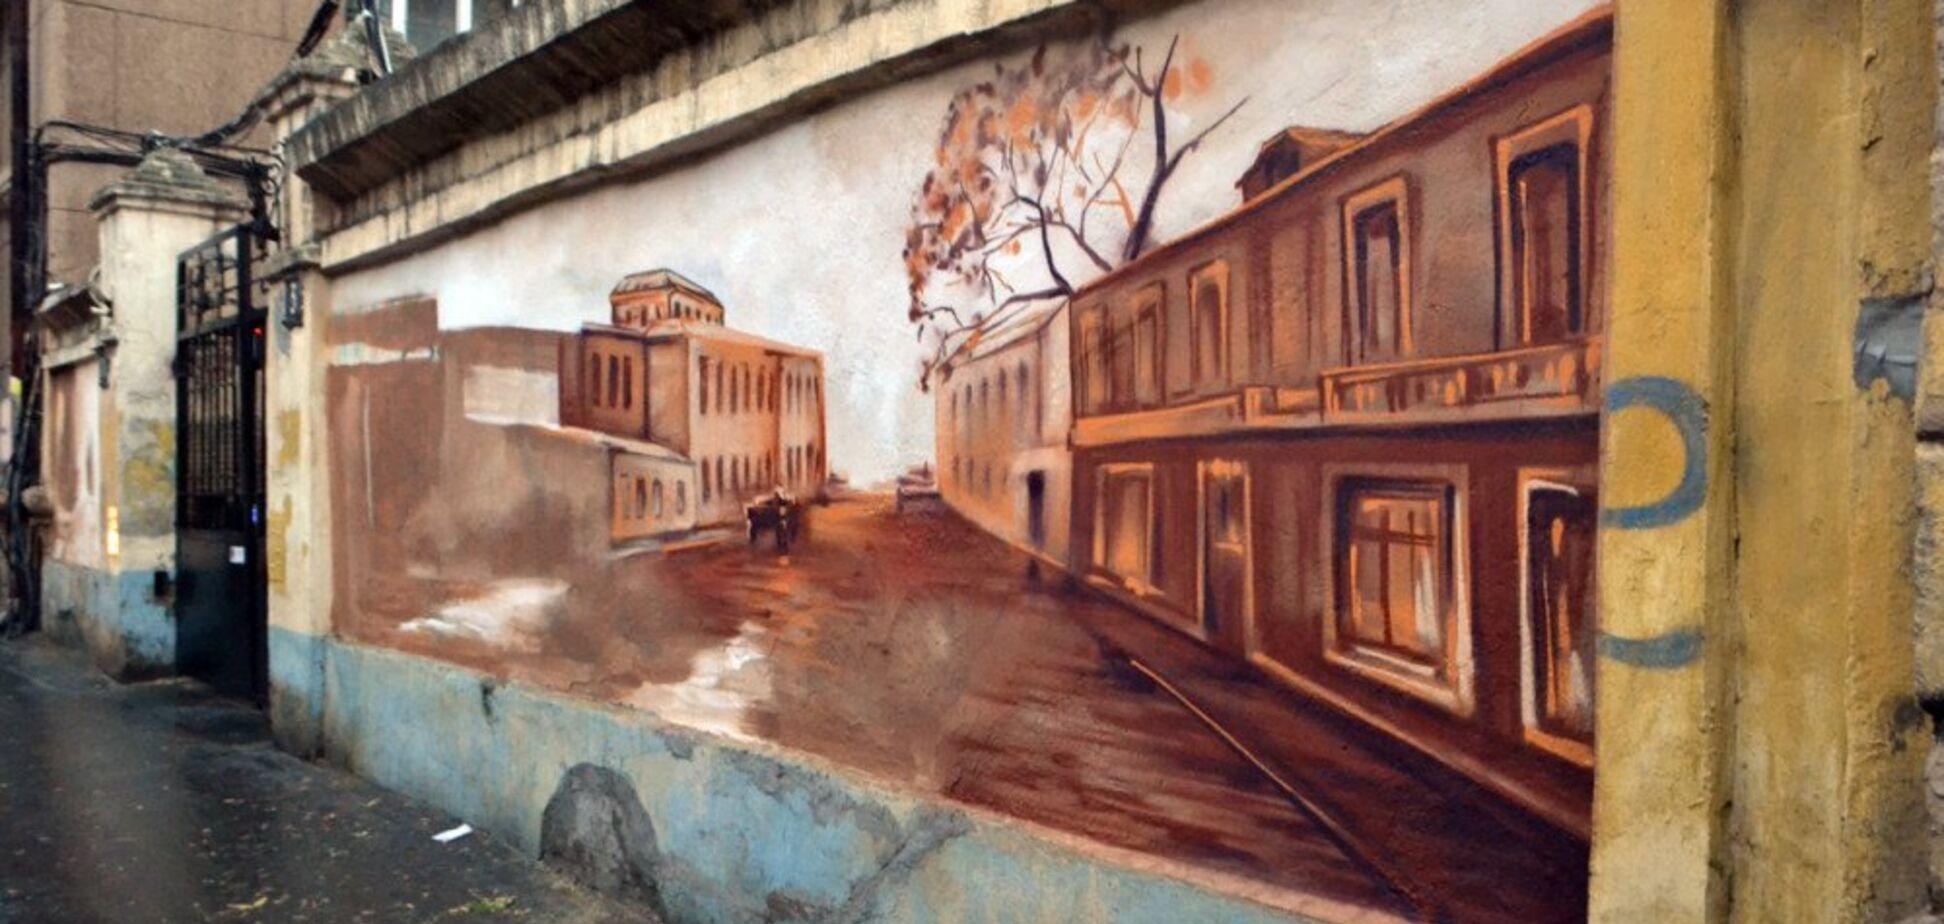 В Одессе создают еще один мурал: фото стрит-арта